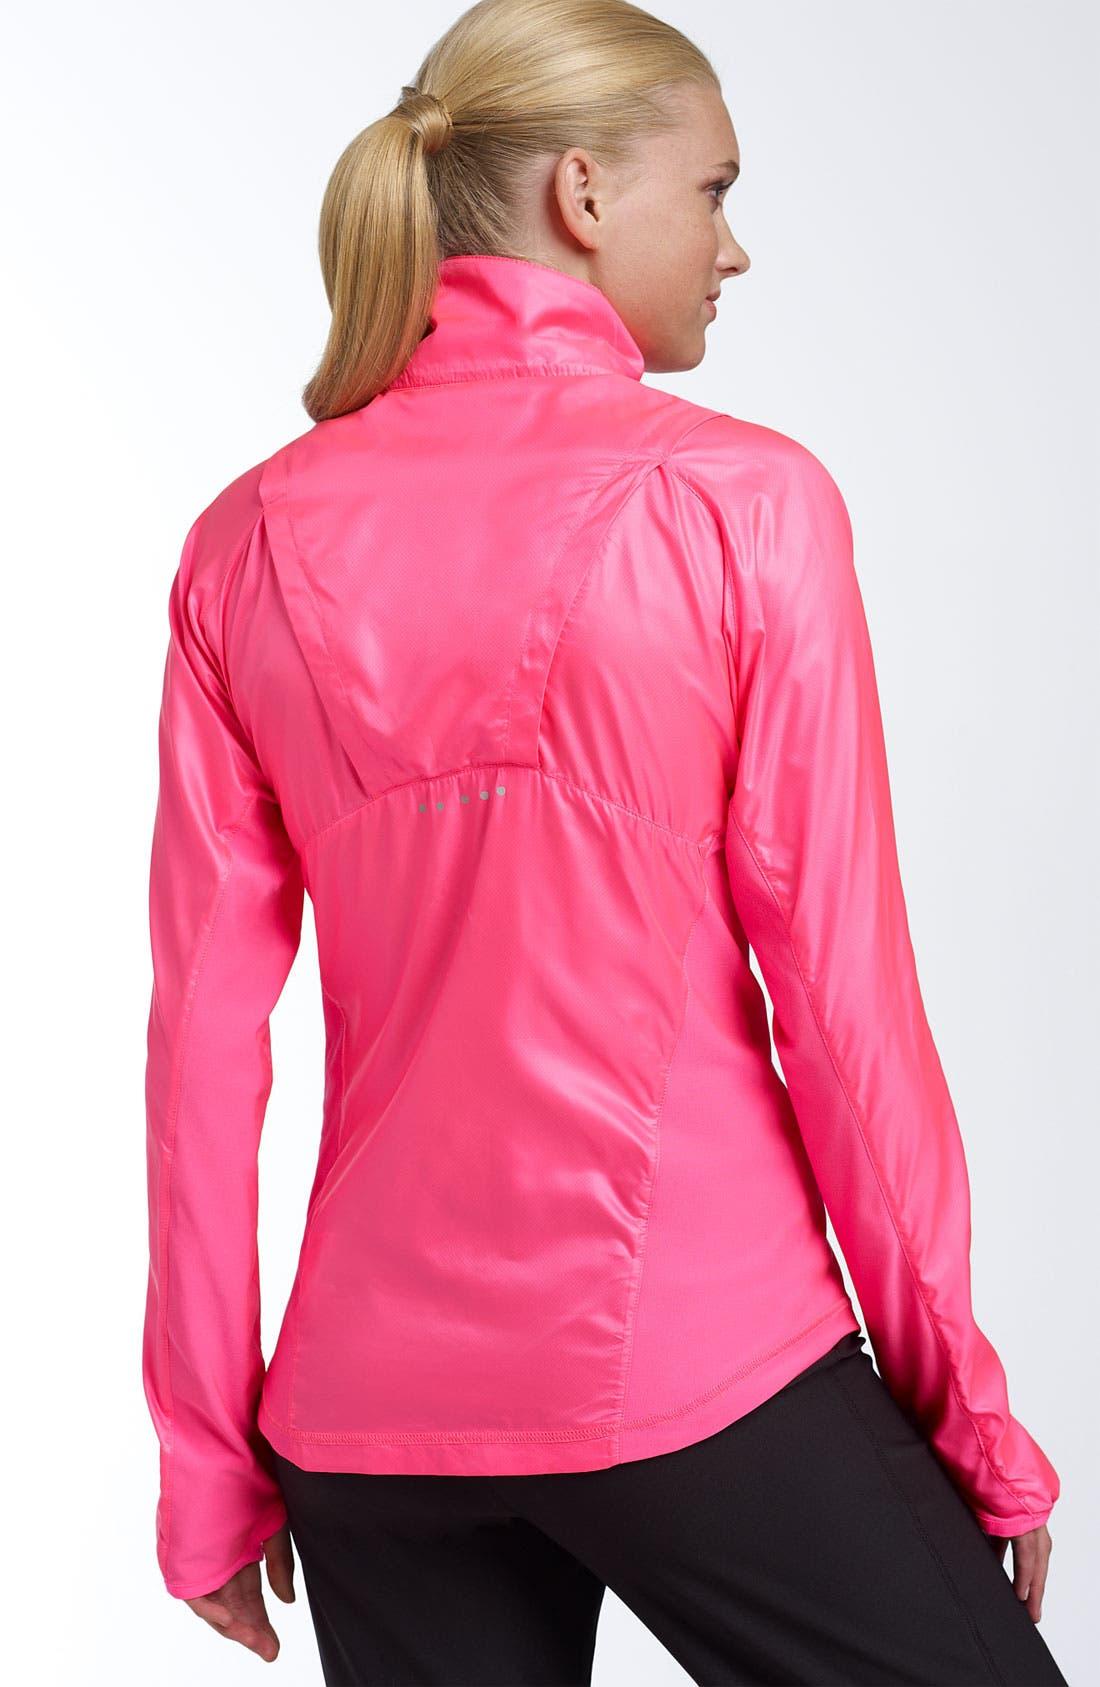 'Pacer' Dri-FIT Jacket,                             Main thumbnail 1, color,                             101